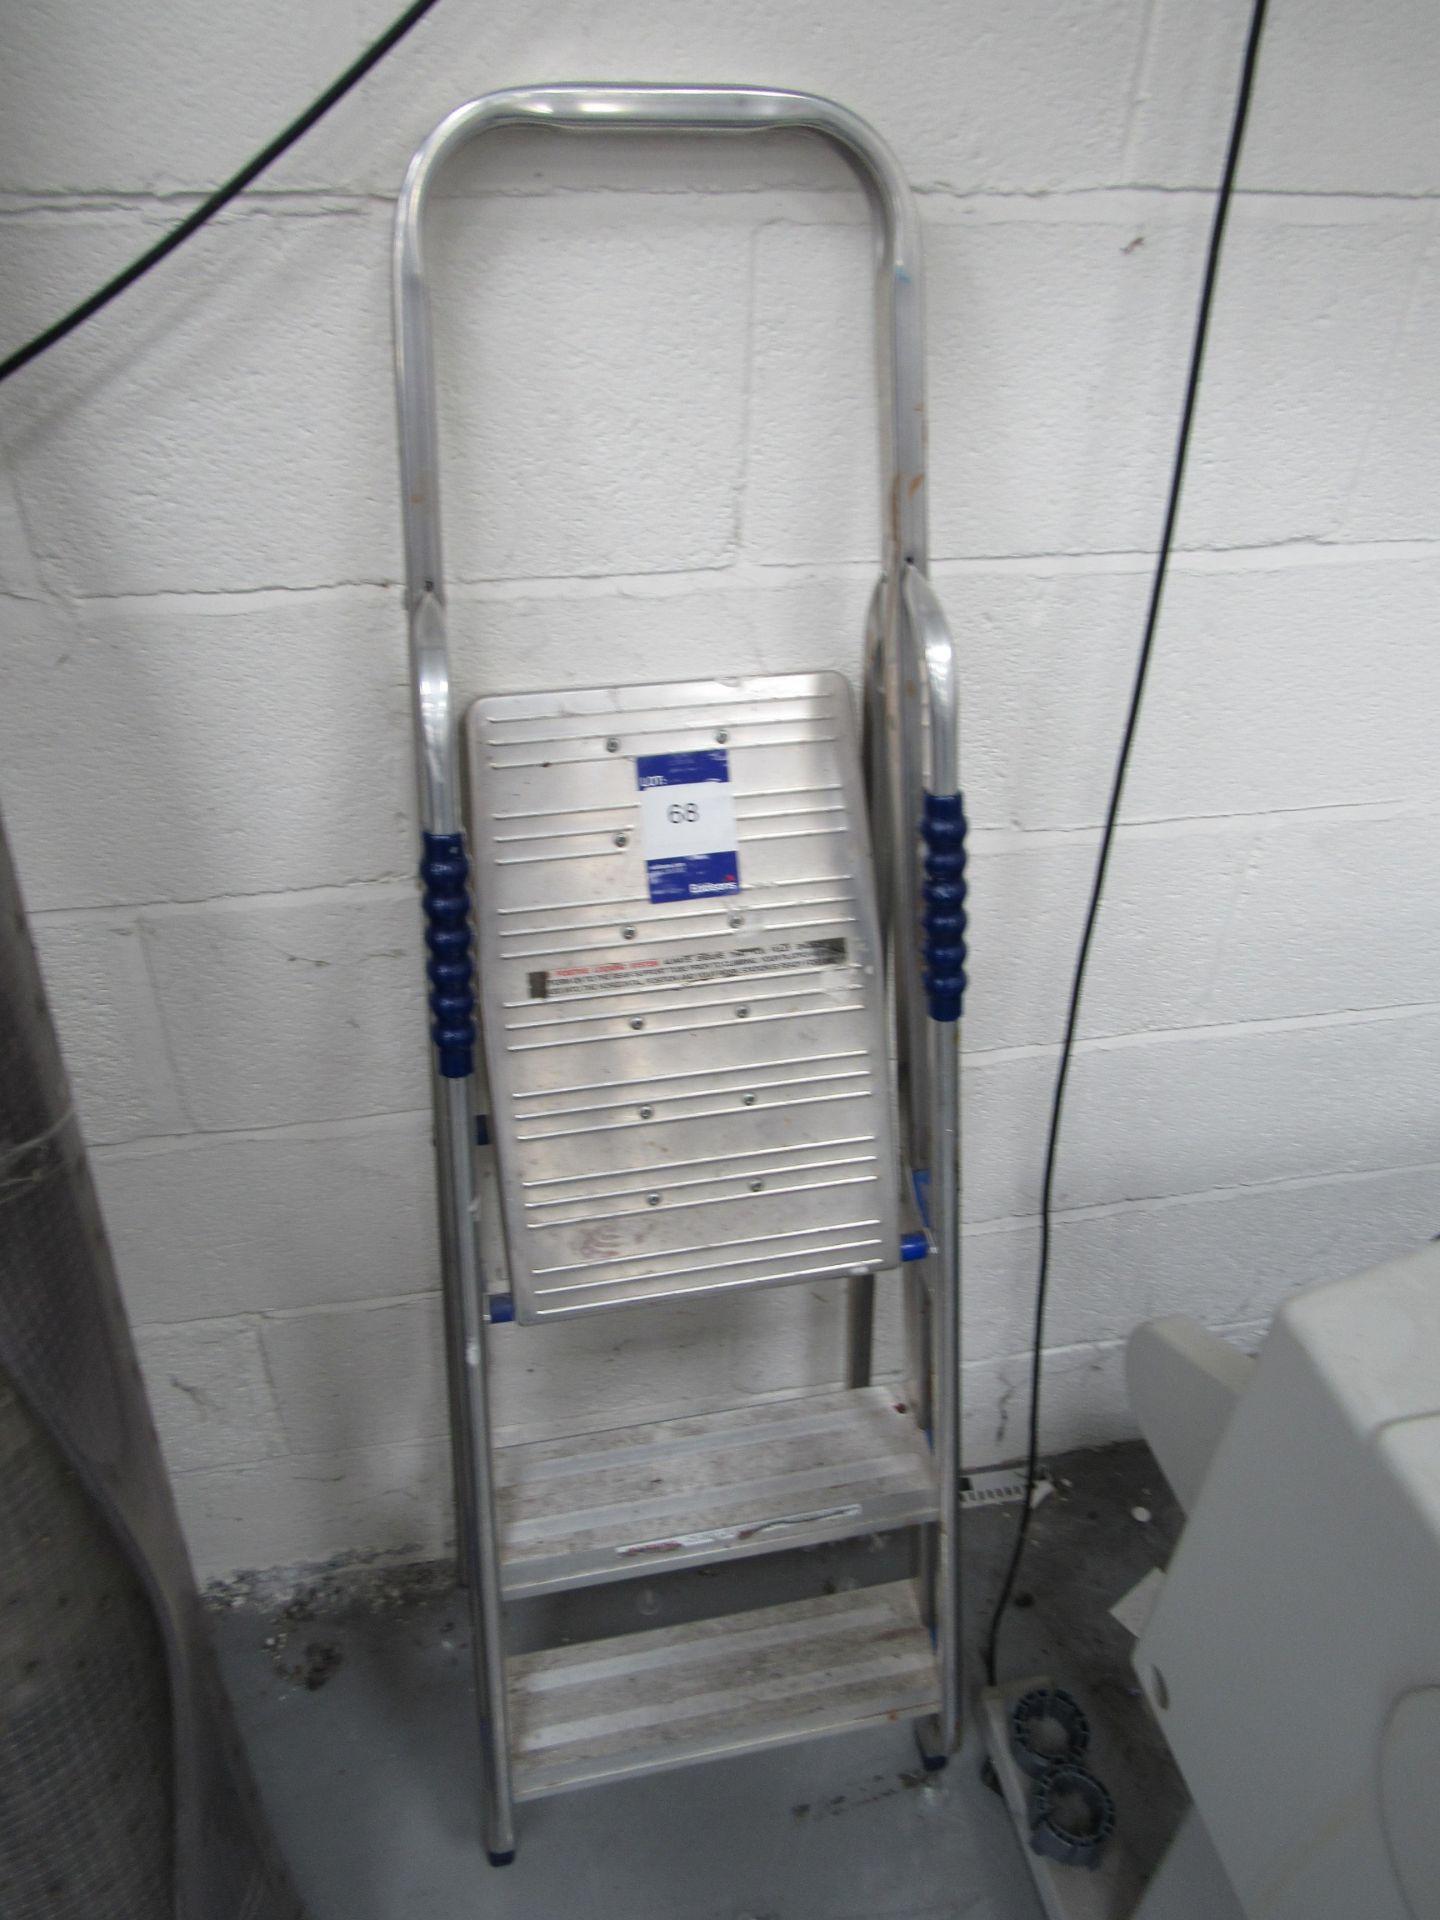 ABRU 2 Tread Step Ladder - Image 2 of 2